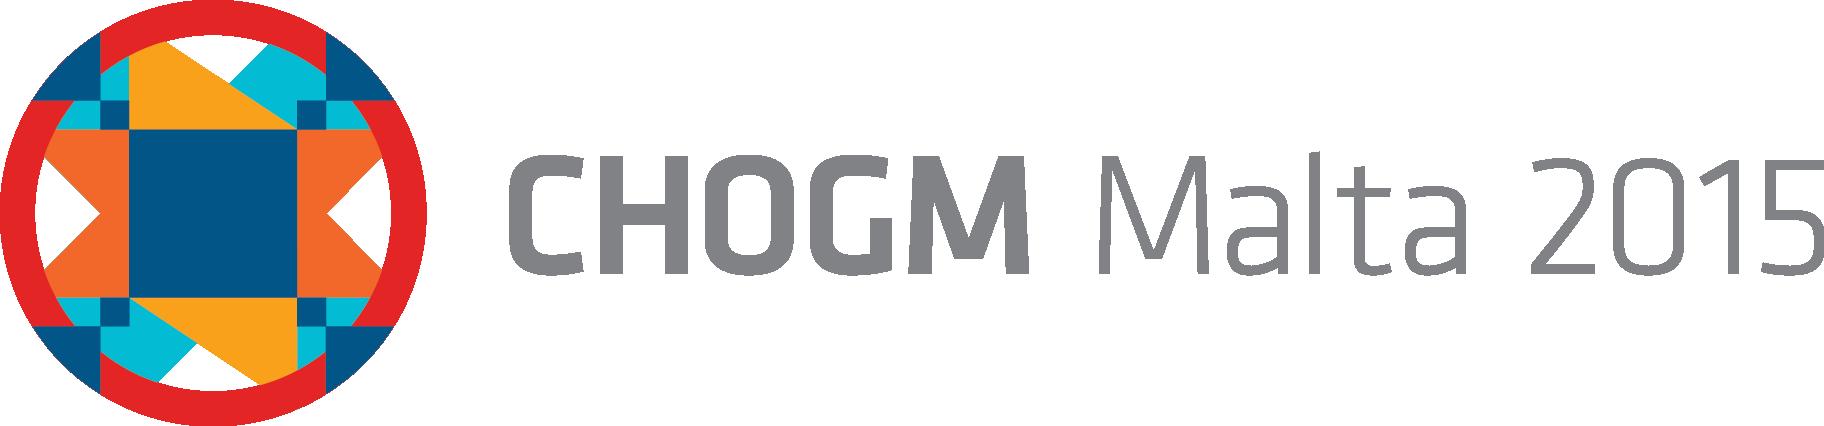 chogm-malta-2015-logo-vertical.png